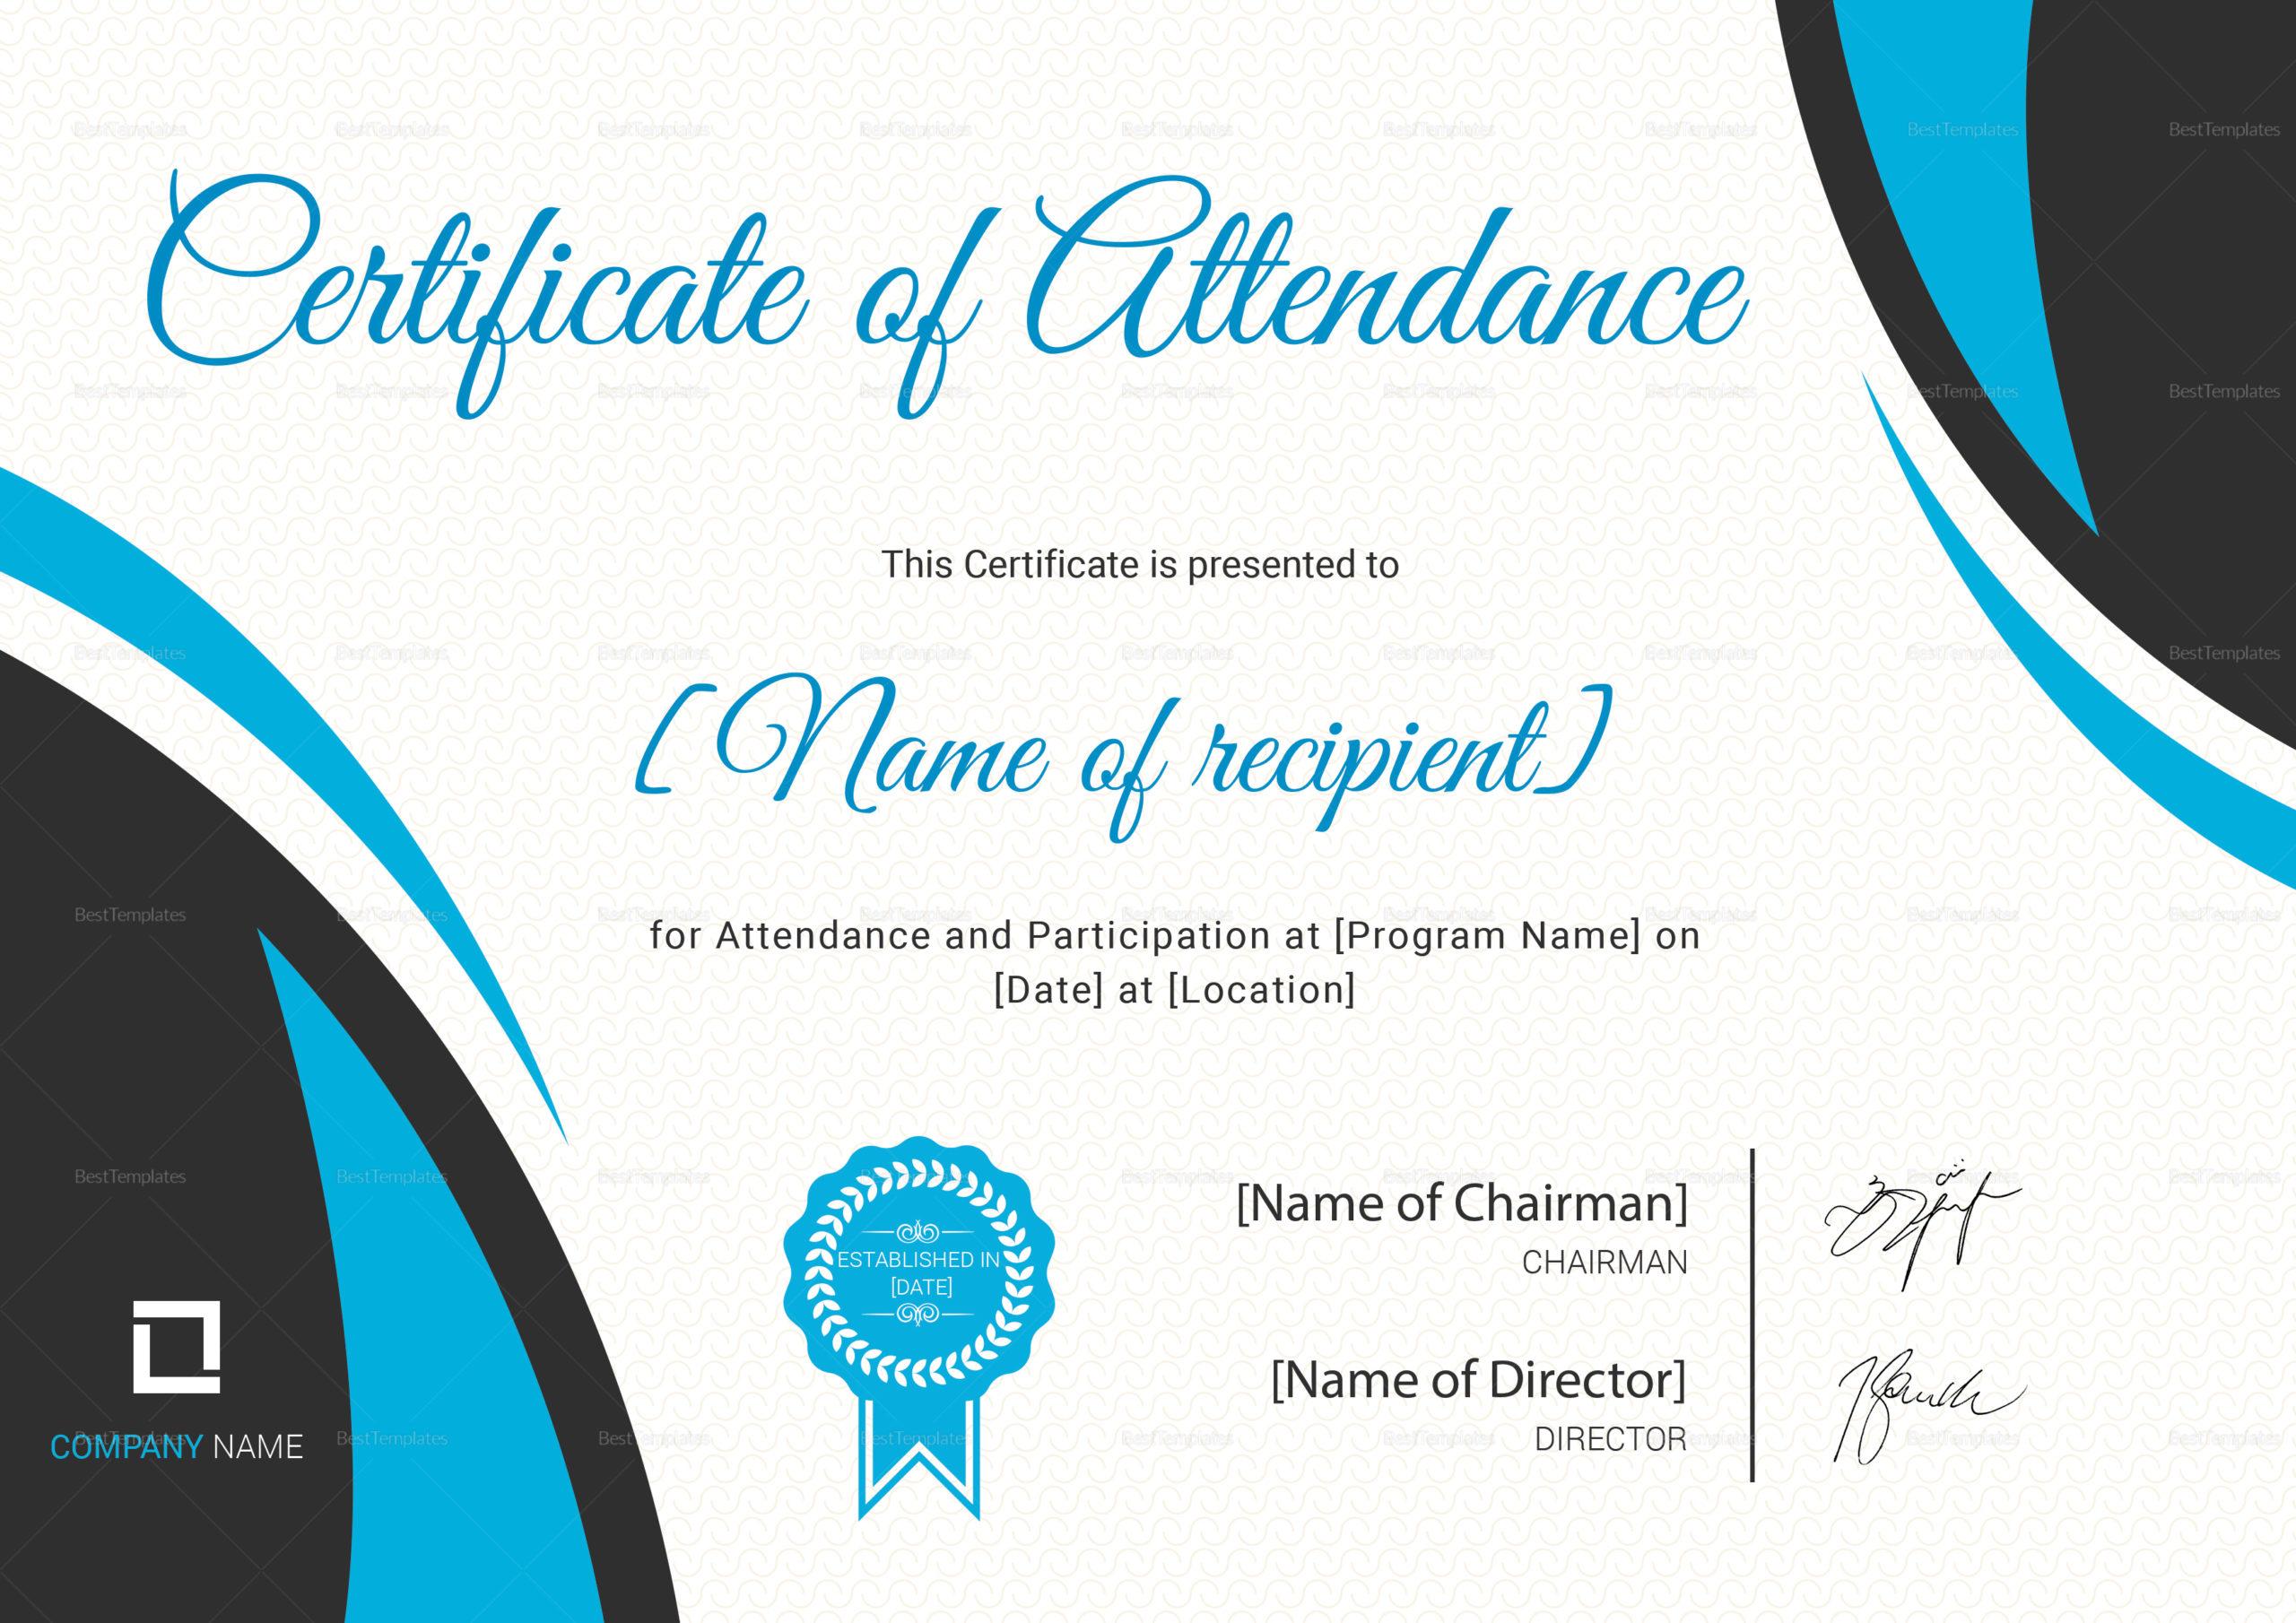 Program Attendance Certificate Design Template In Psd Word intended for Attendance Certificate Template Word